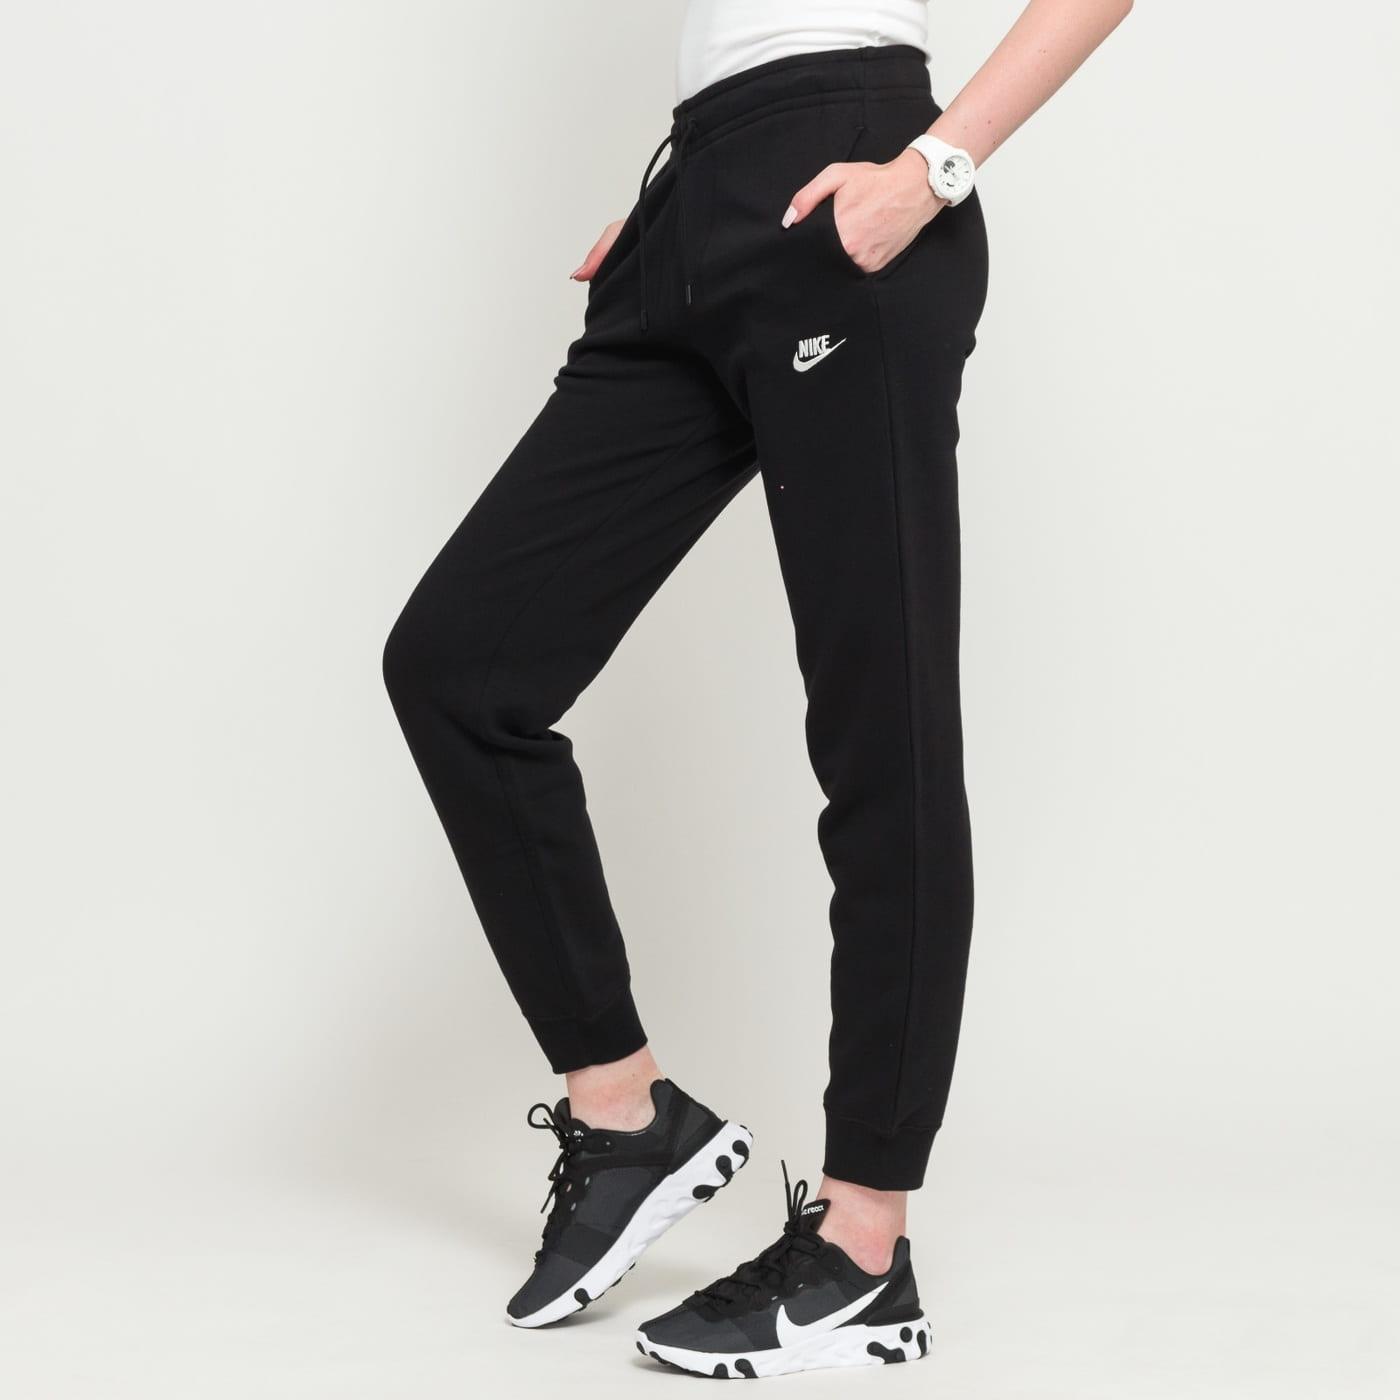 pantaloni sportivo nike donna